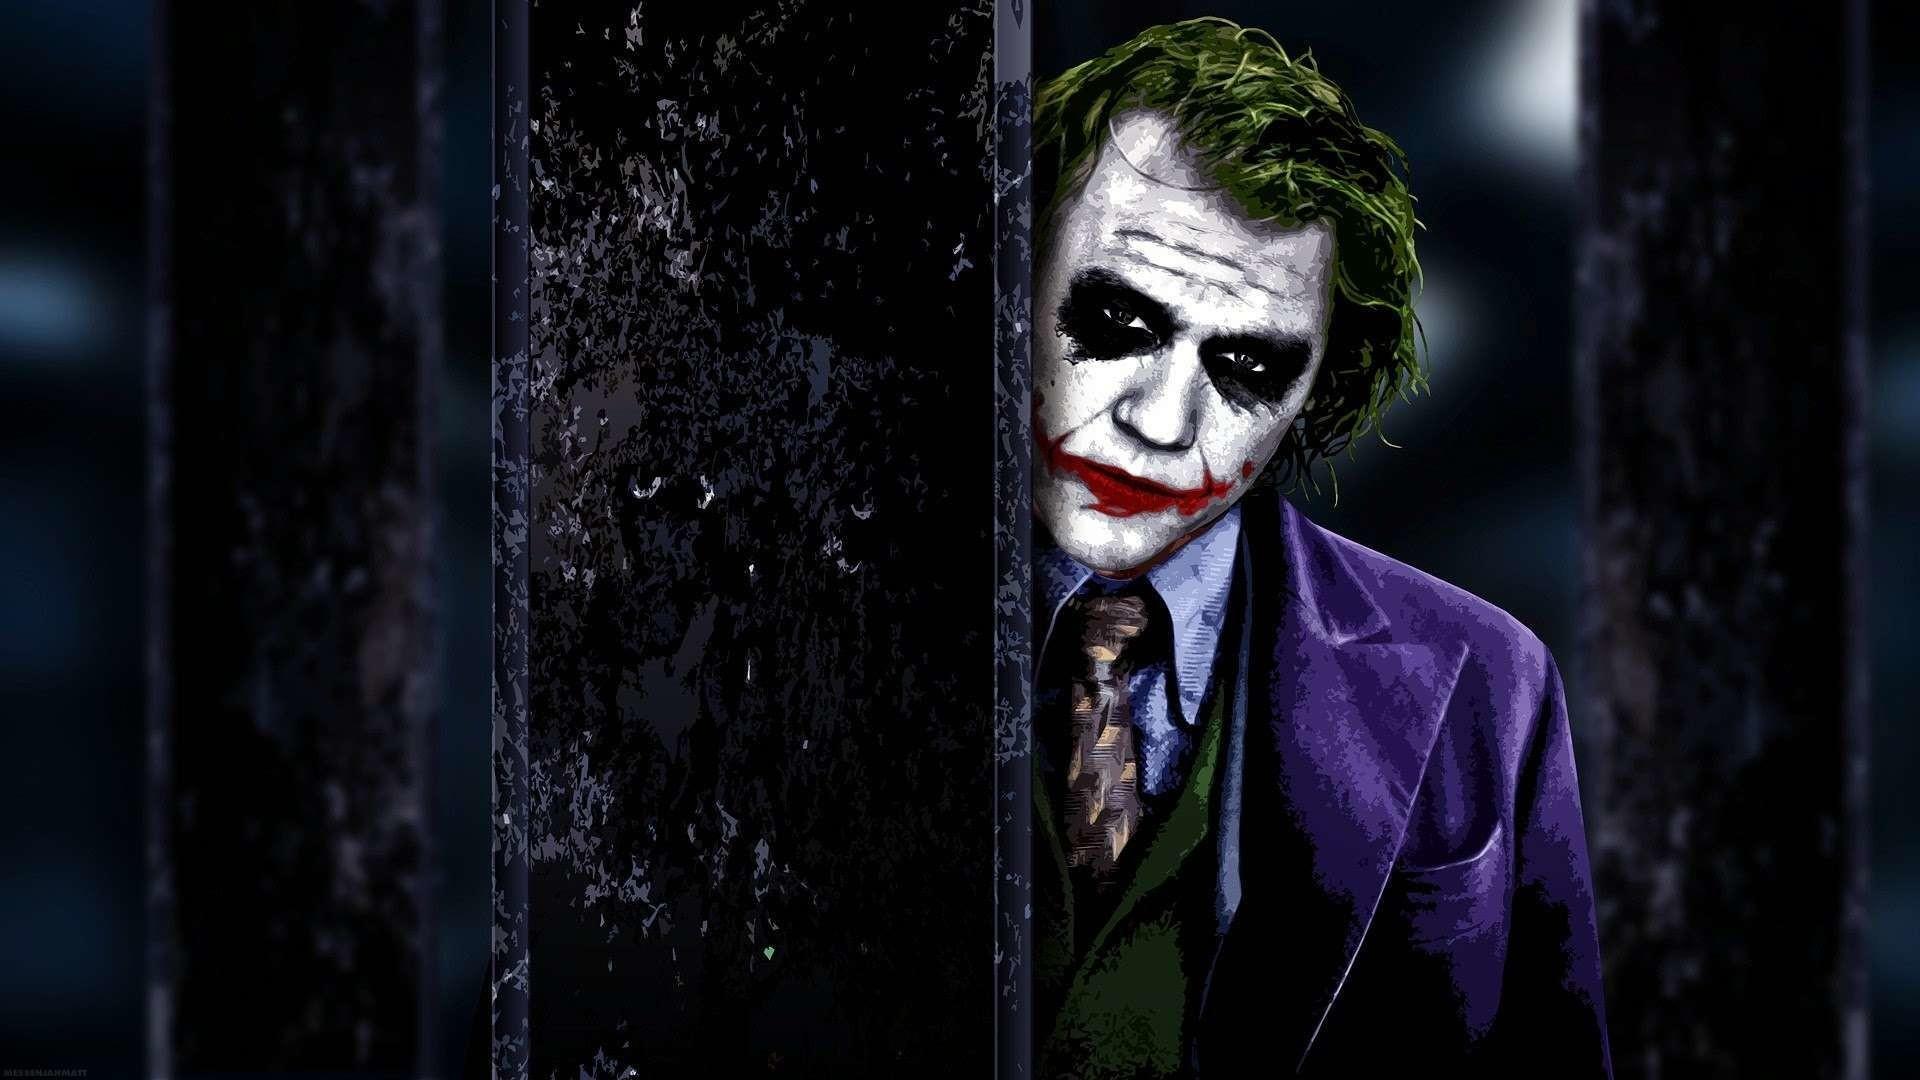 Explore Joker Quotes, The Joker, and more! Joker HD Images Wallpaper 1080p